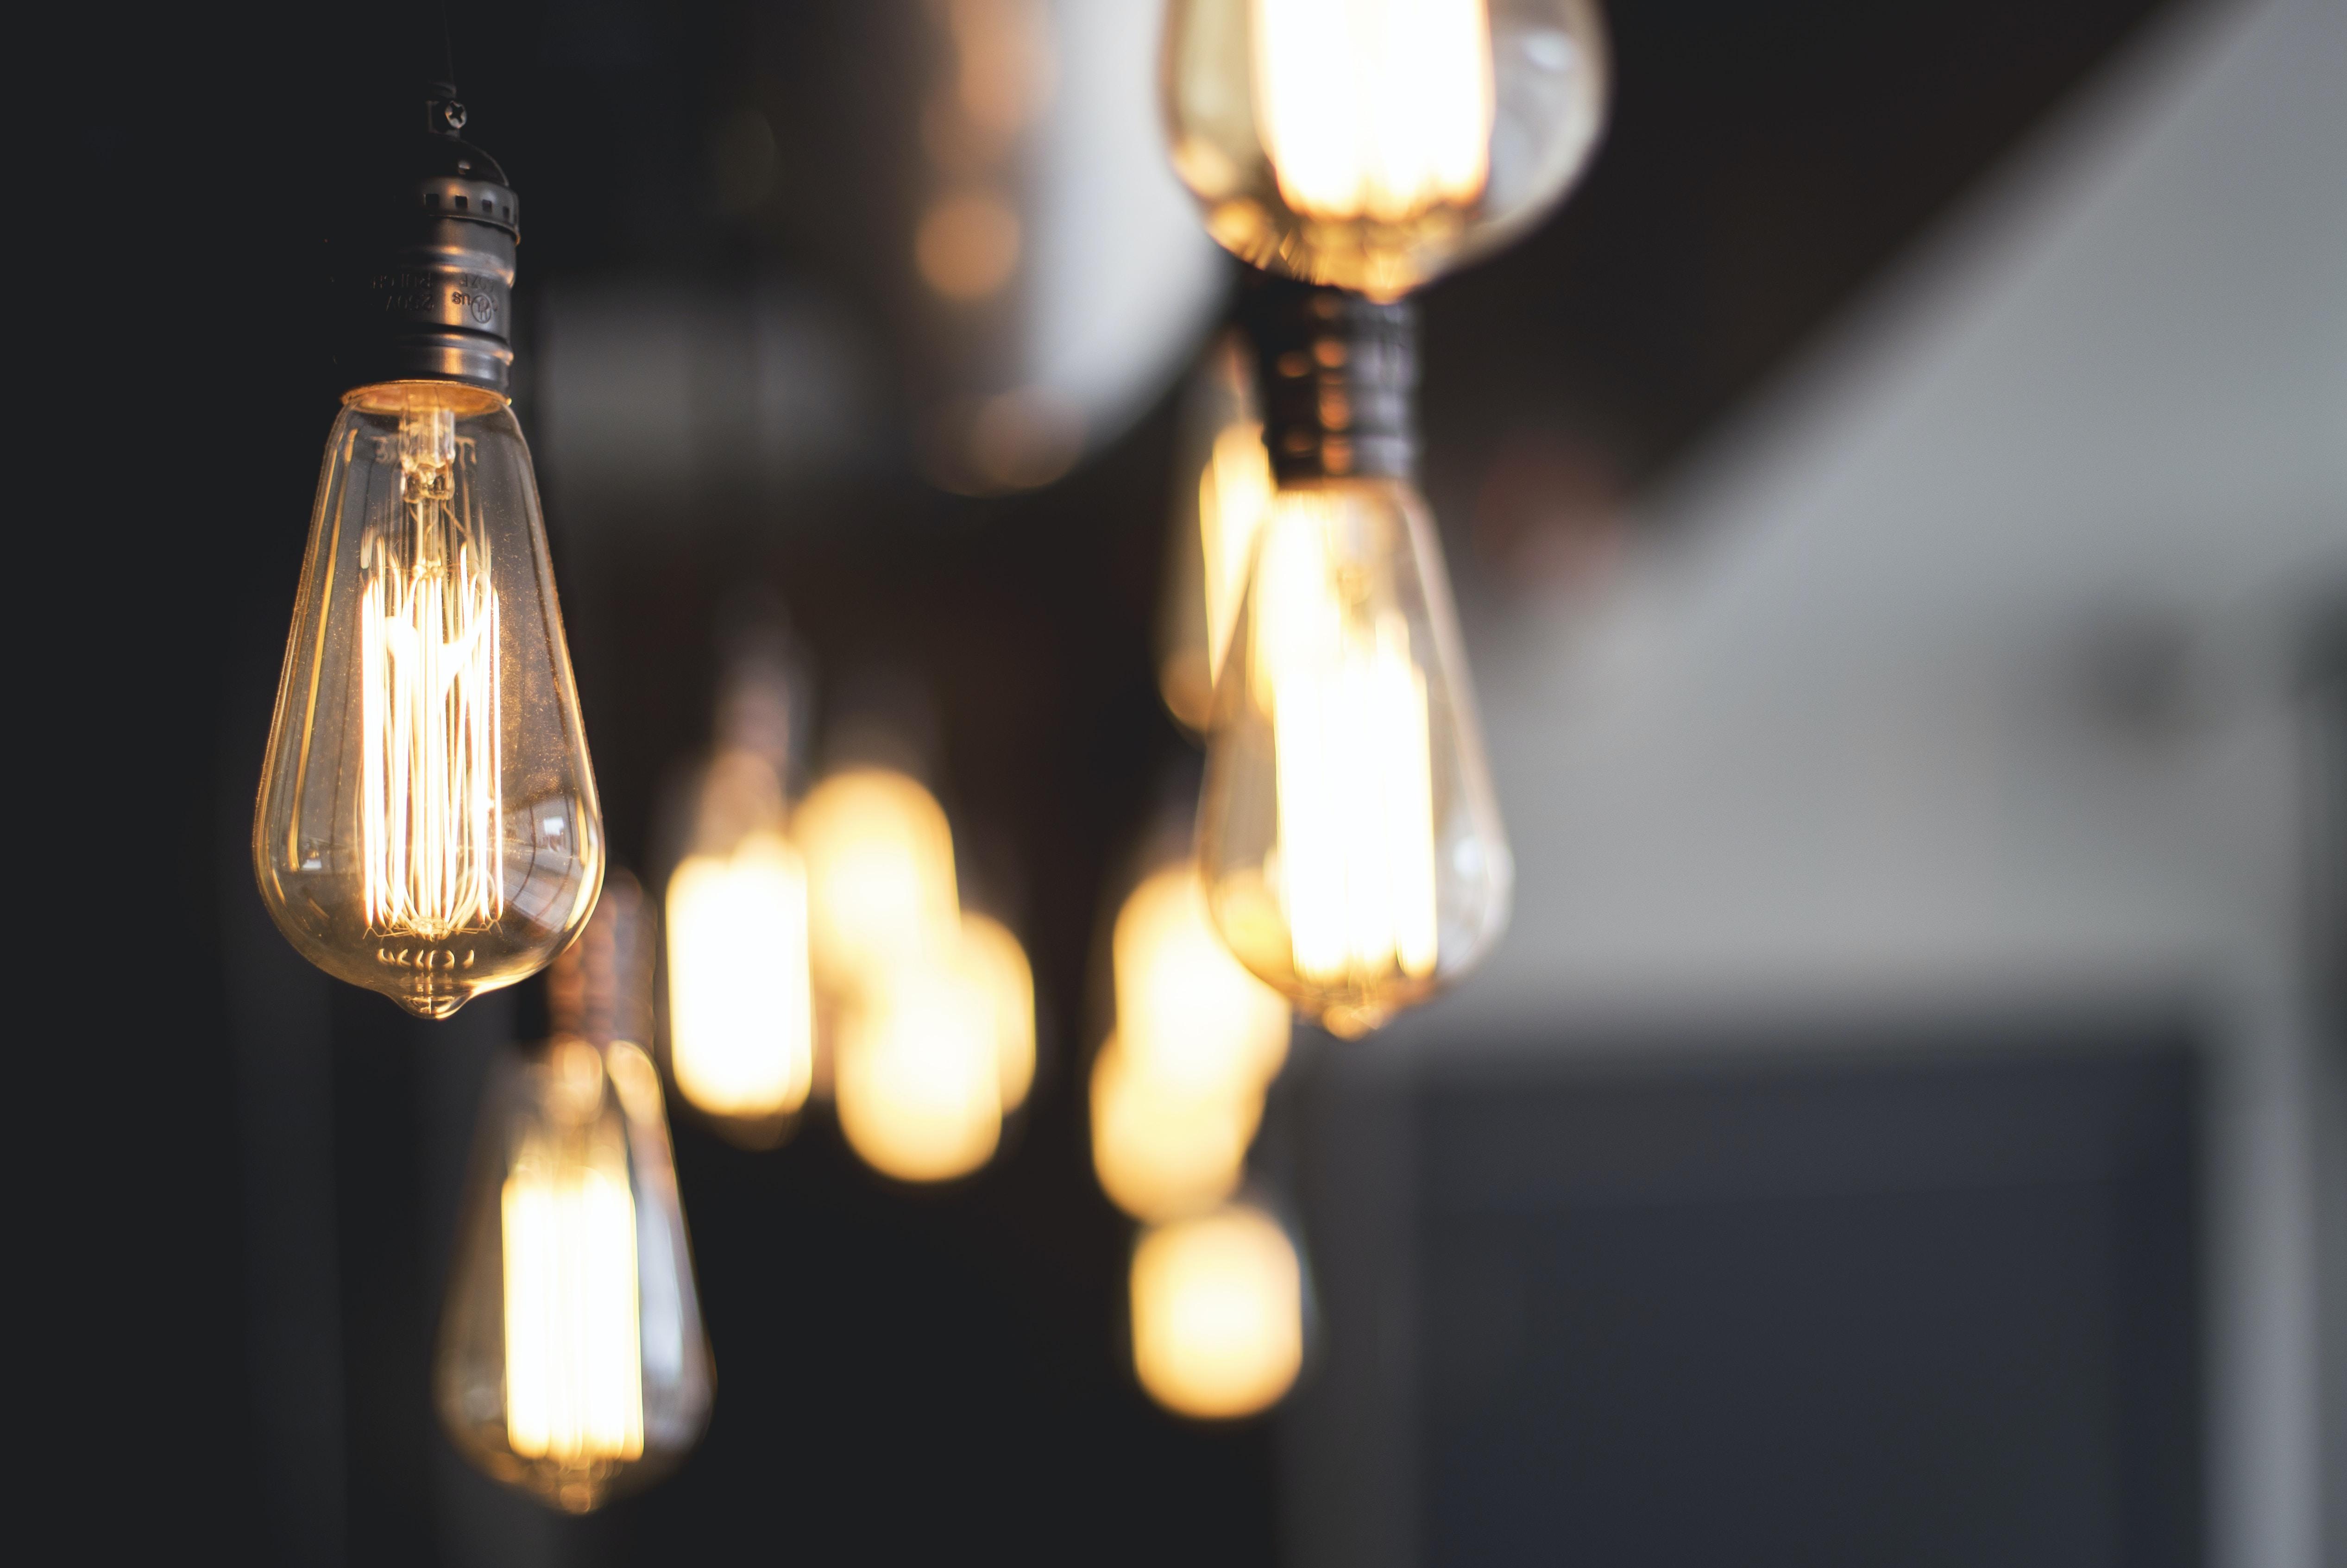 Lights struggle stories